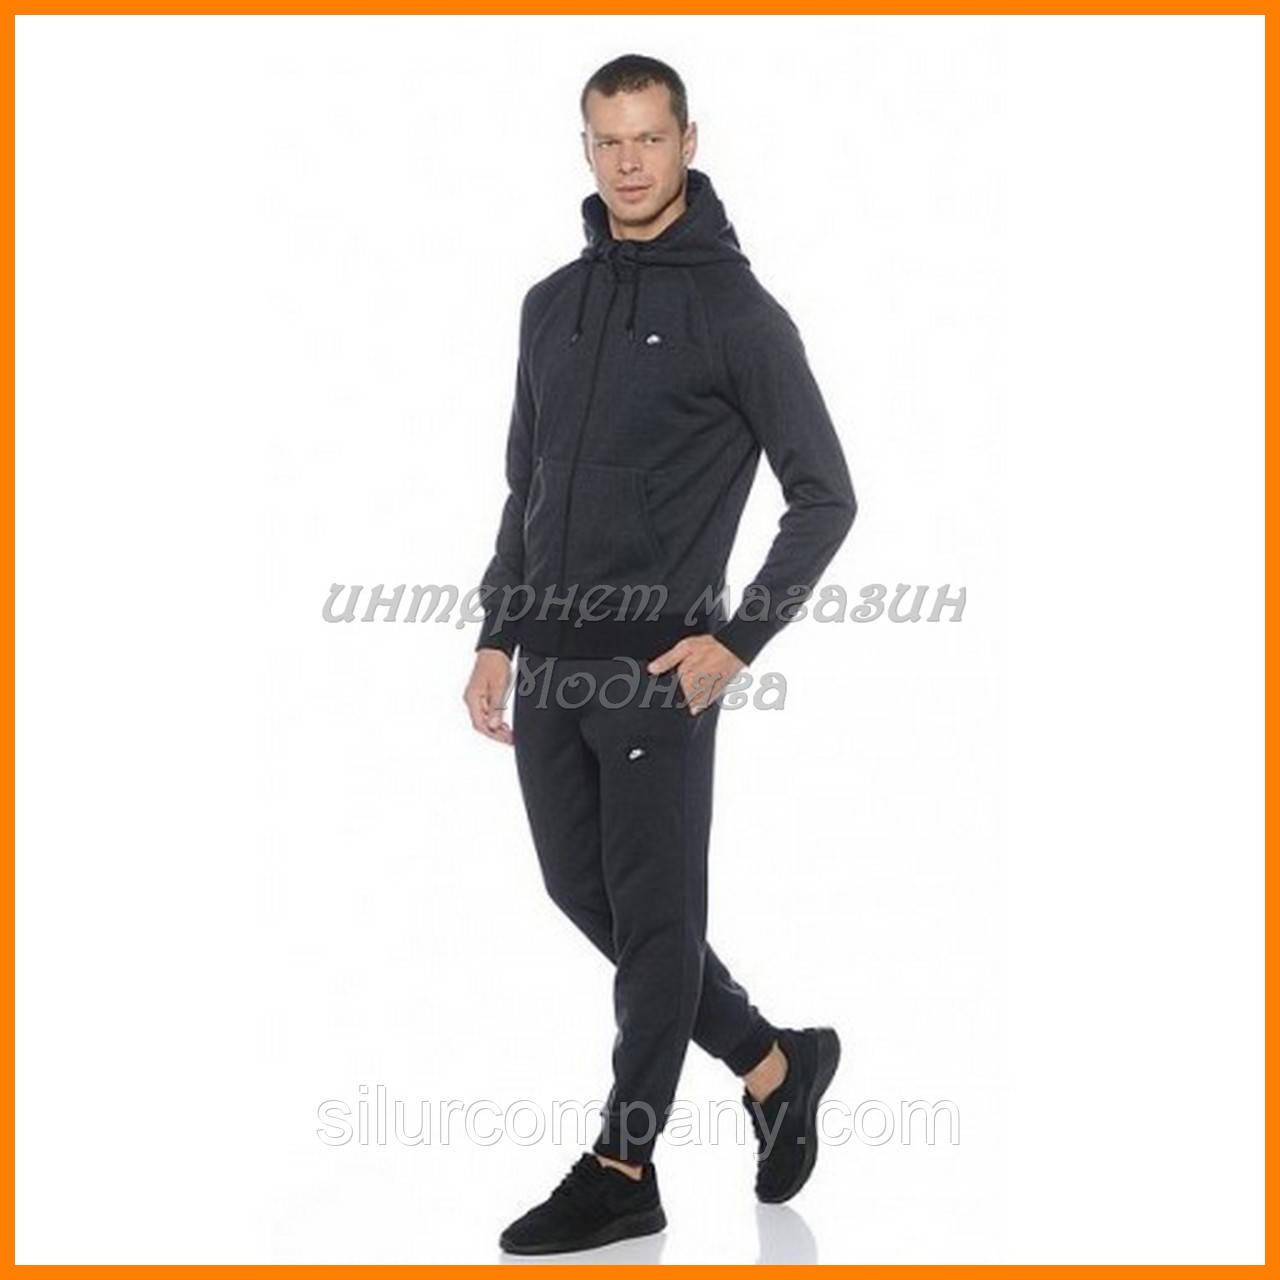 2bd118775e4e Спортивный костюм Nike мужской   темно-серый - Интернет магазин